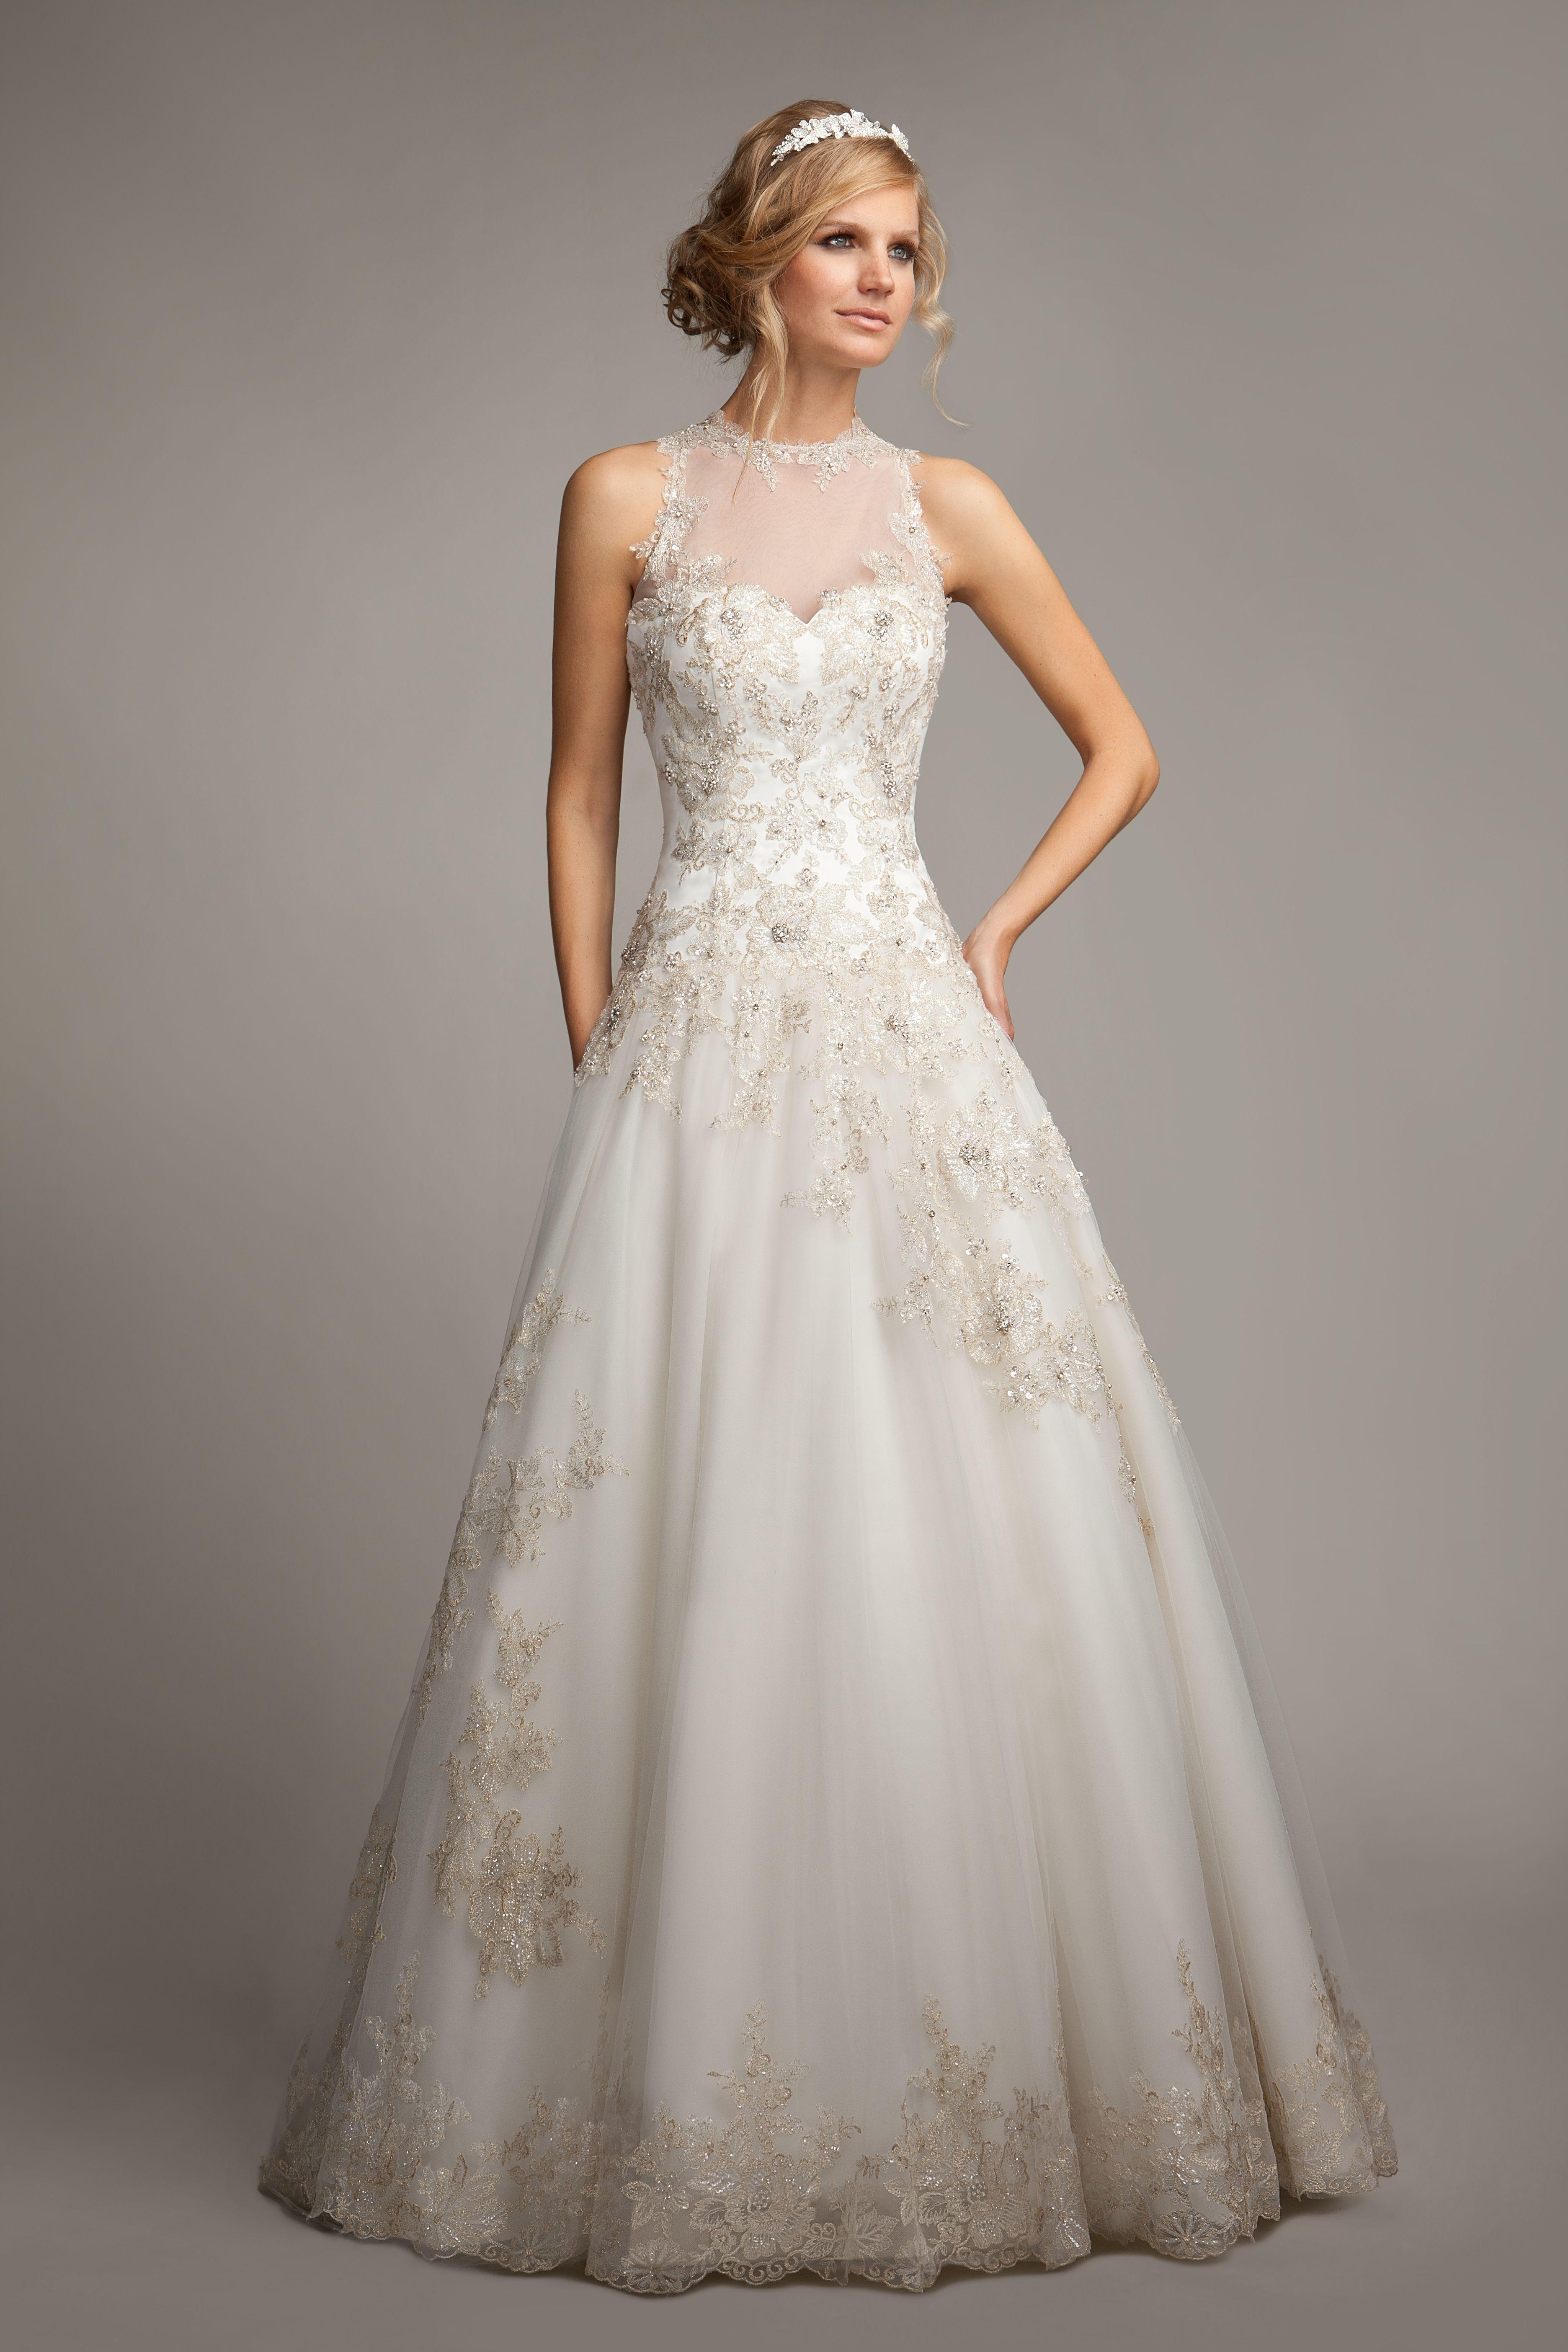 Darcy byemmalouise bridal boutique bolton httpwww darcy byemmalouise bridal boutique bolton httpemmalouisebridal ombrellifo Gallery